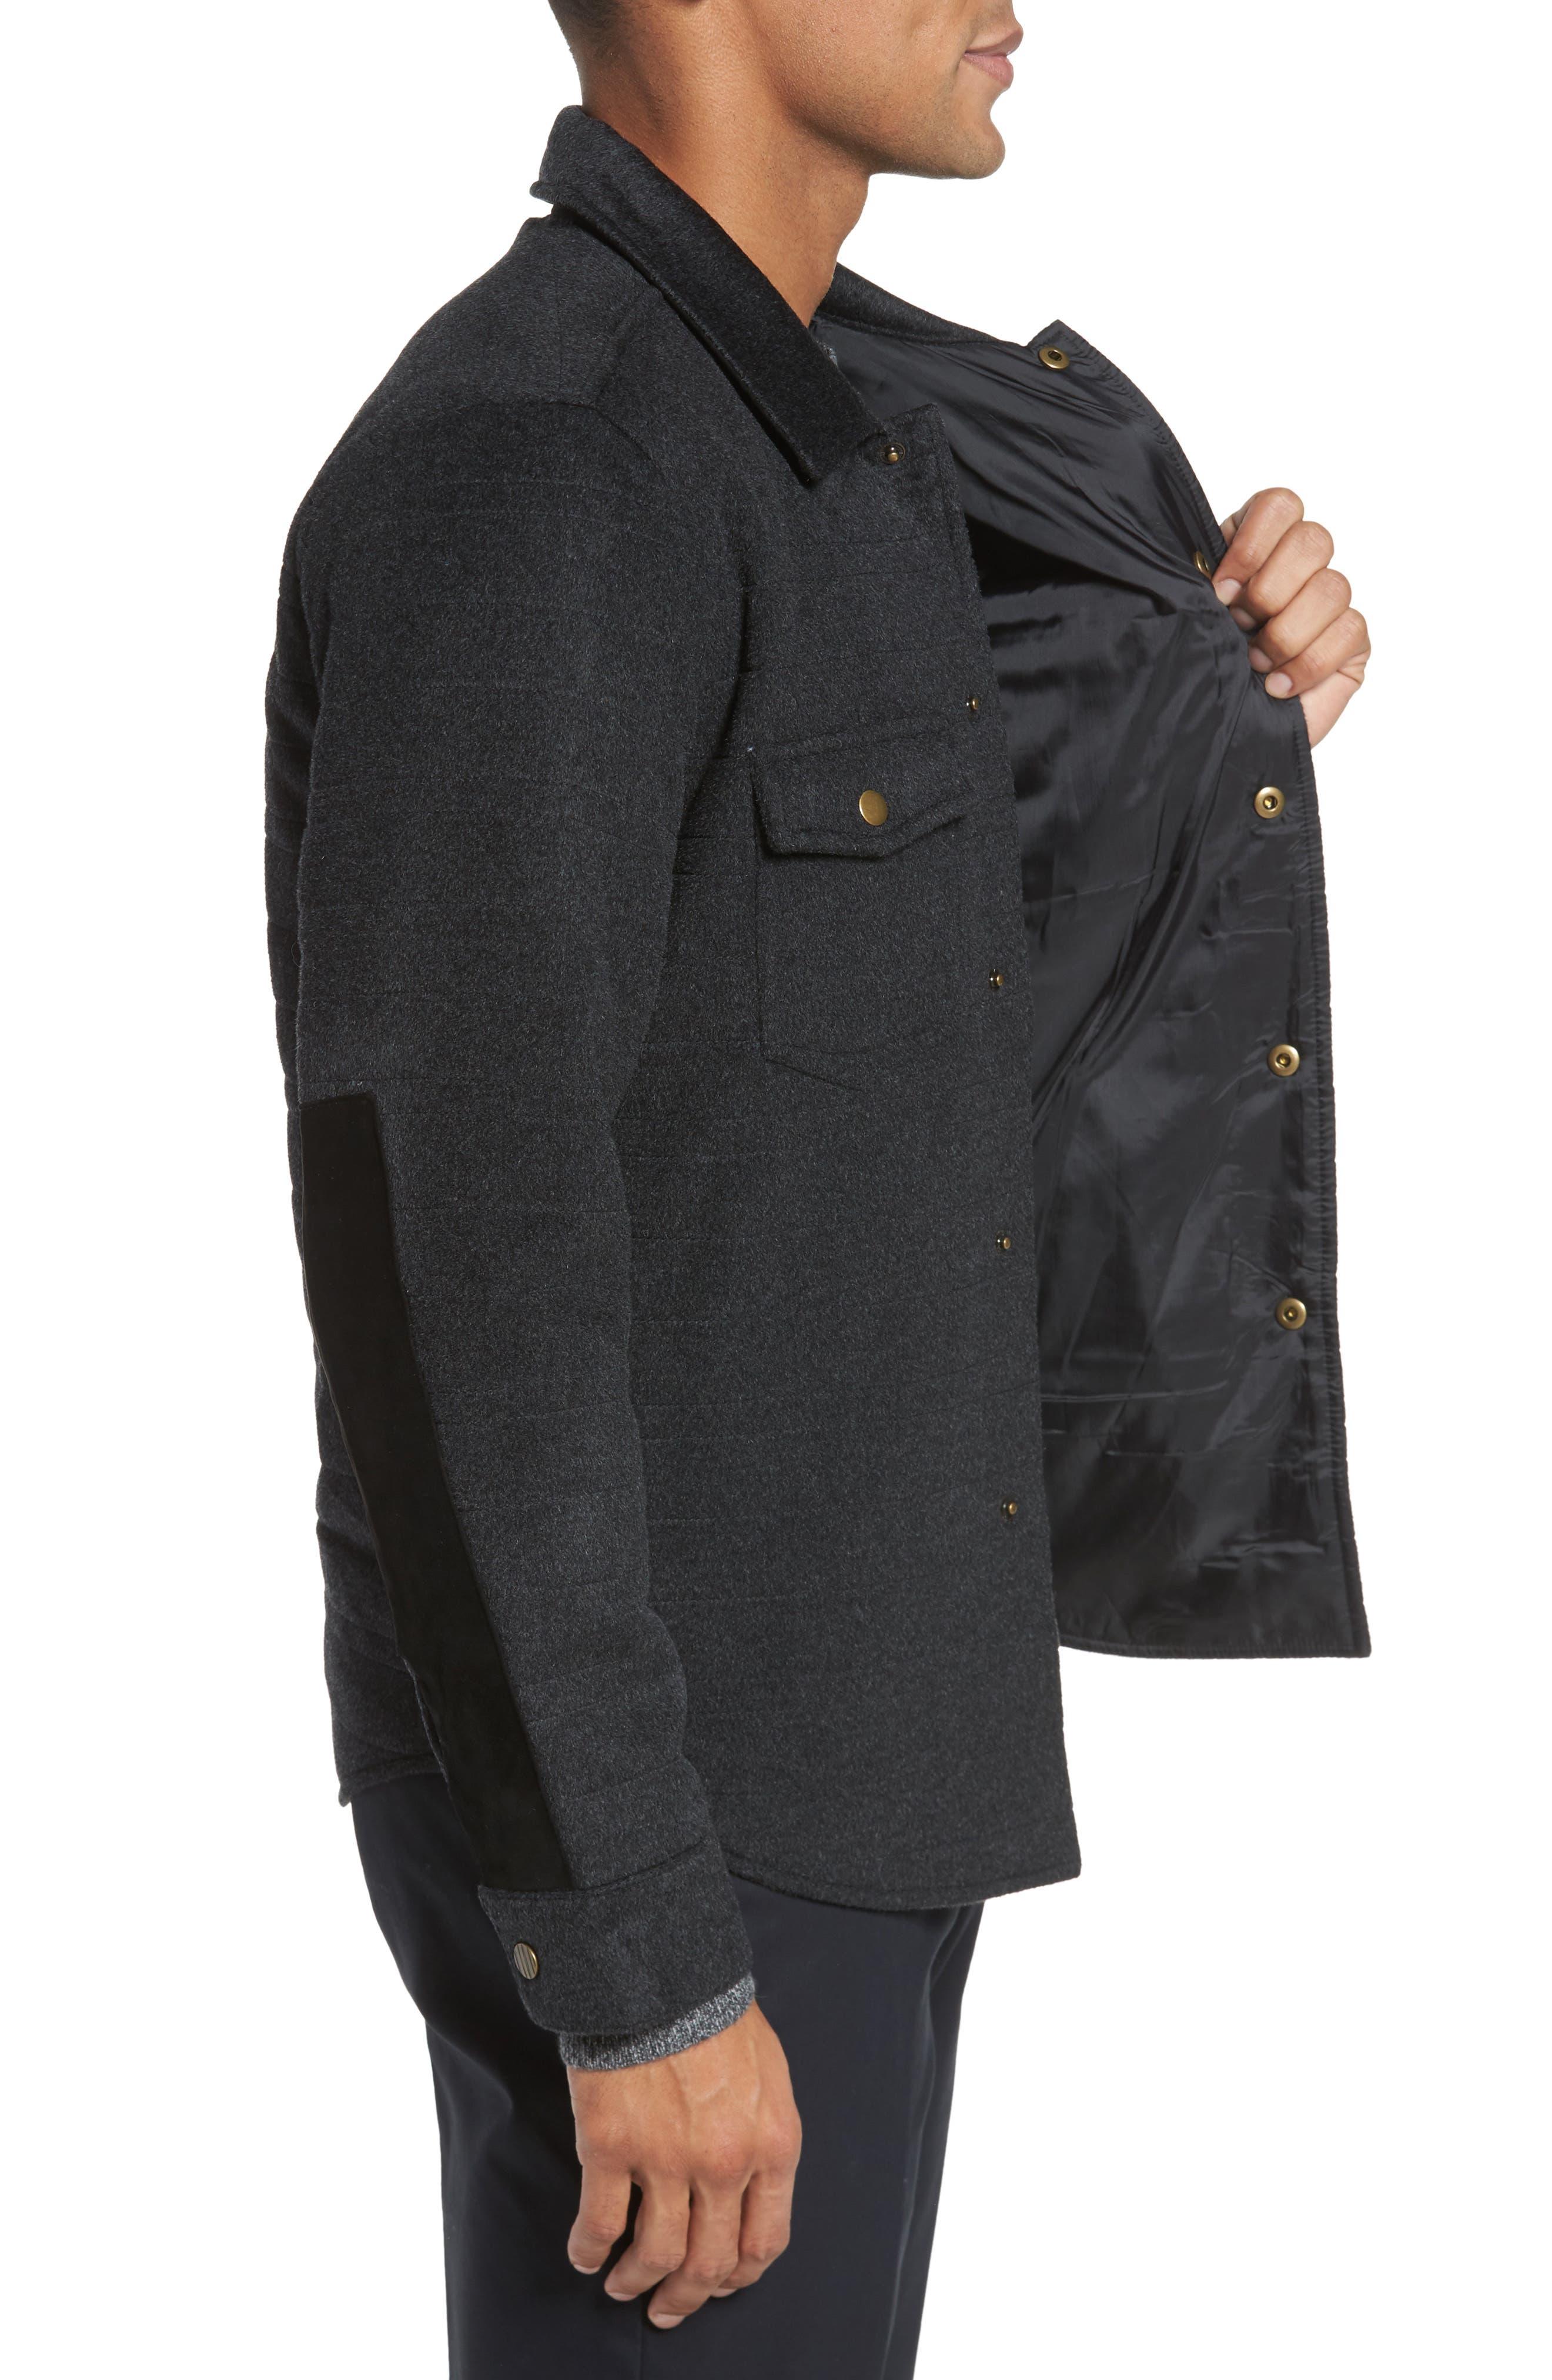 Michael Slim Fit Quilted Shirt Jacket,                             Alternate thumbnail 3, color,                             Dark Char Melange